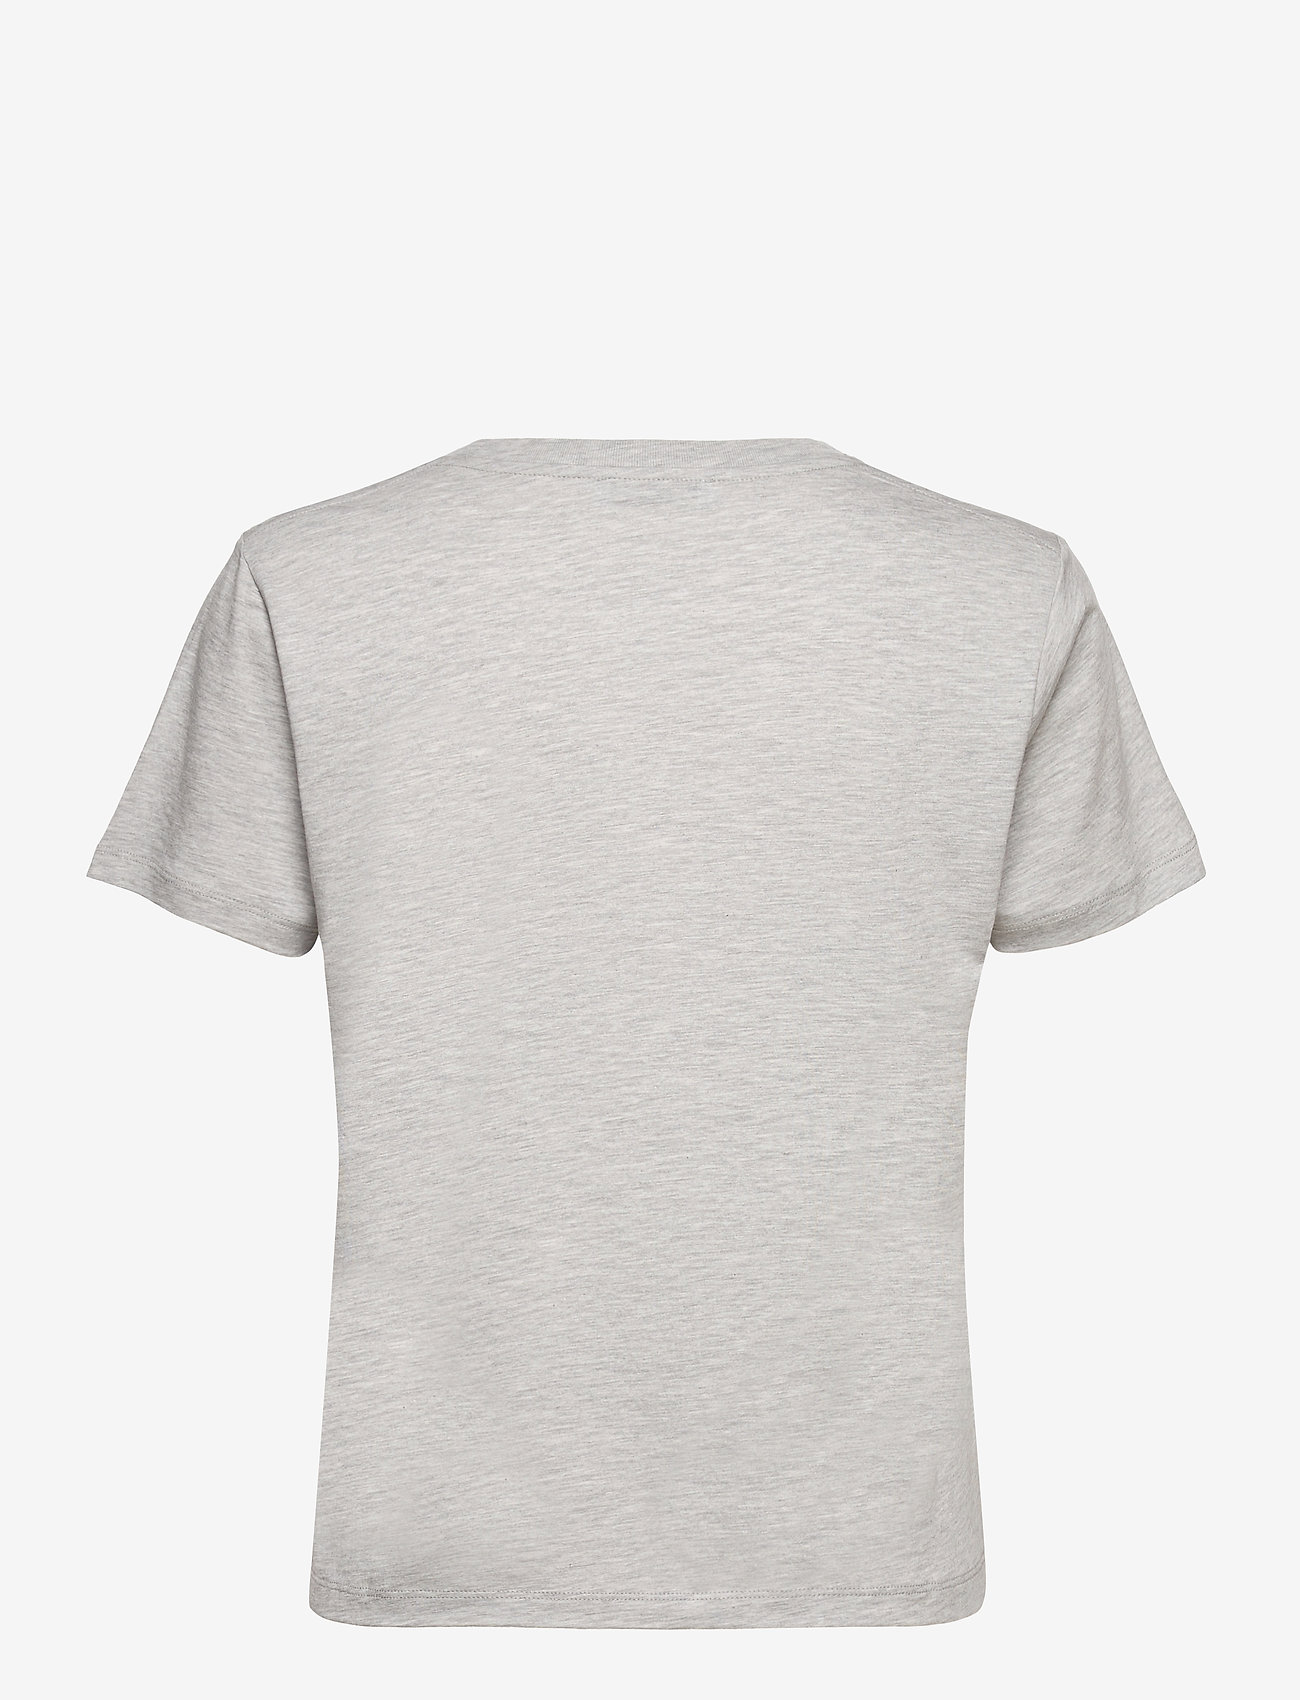 RODEBJER - RODEBJER NINJA LOGO - t-shirts - grey melange - 1